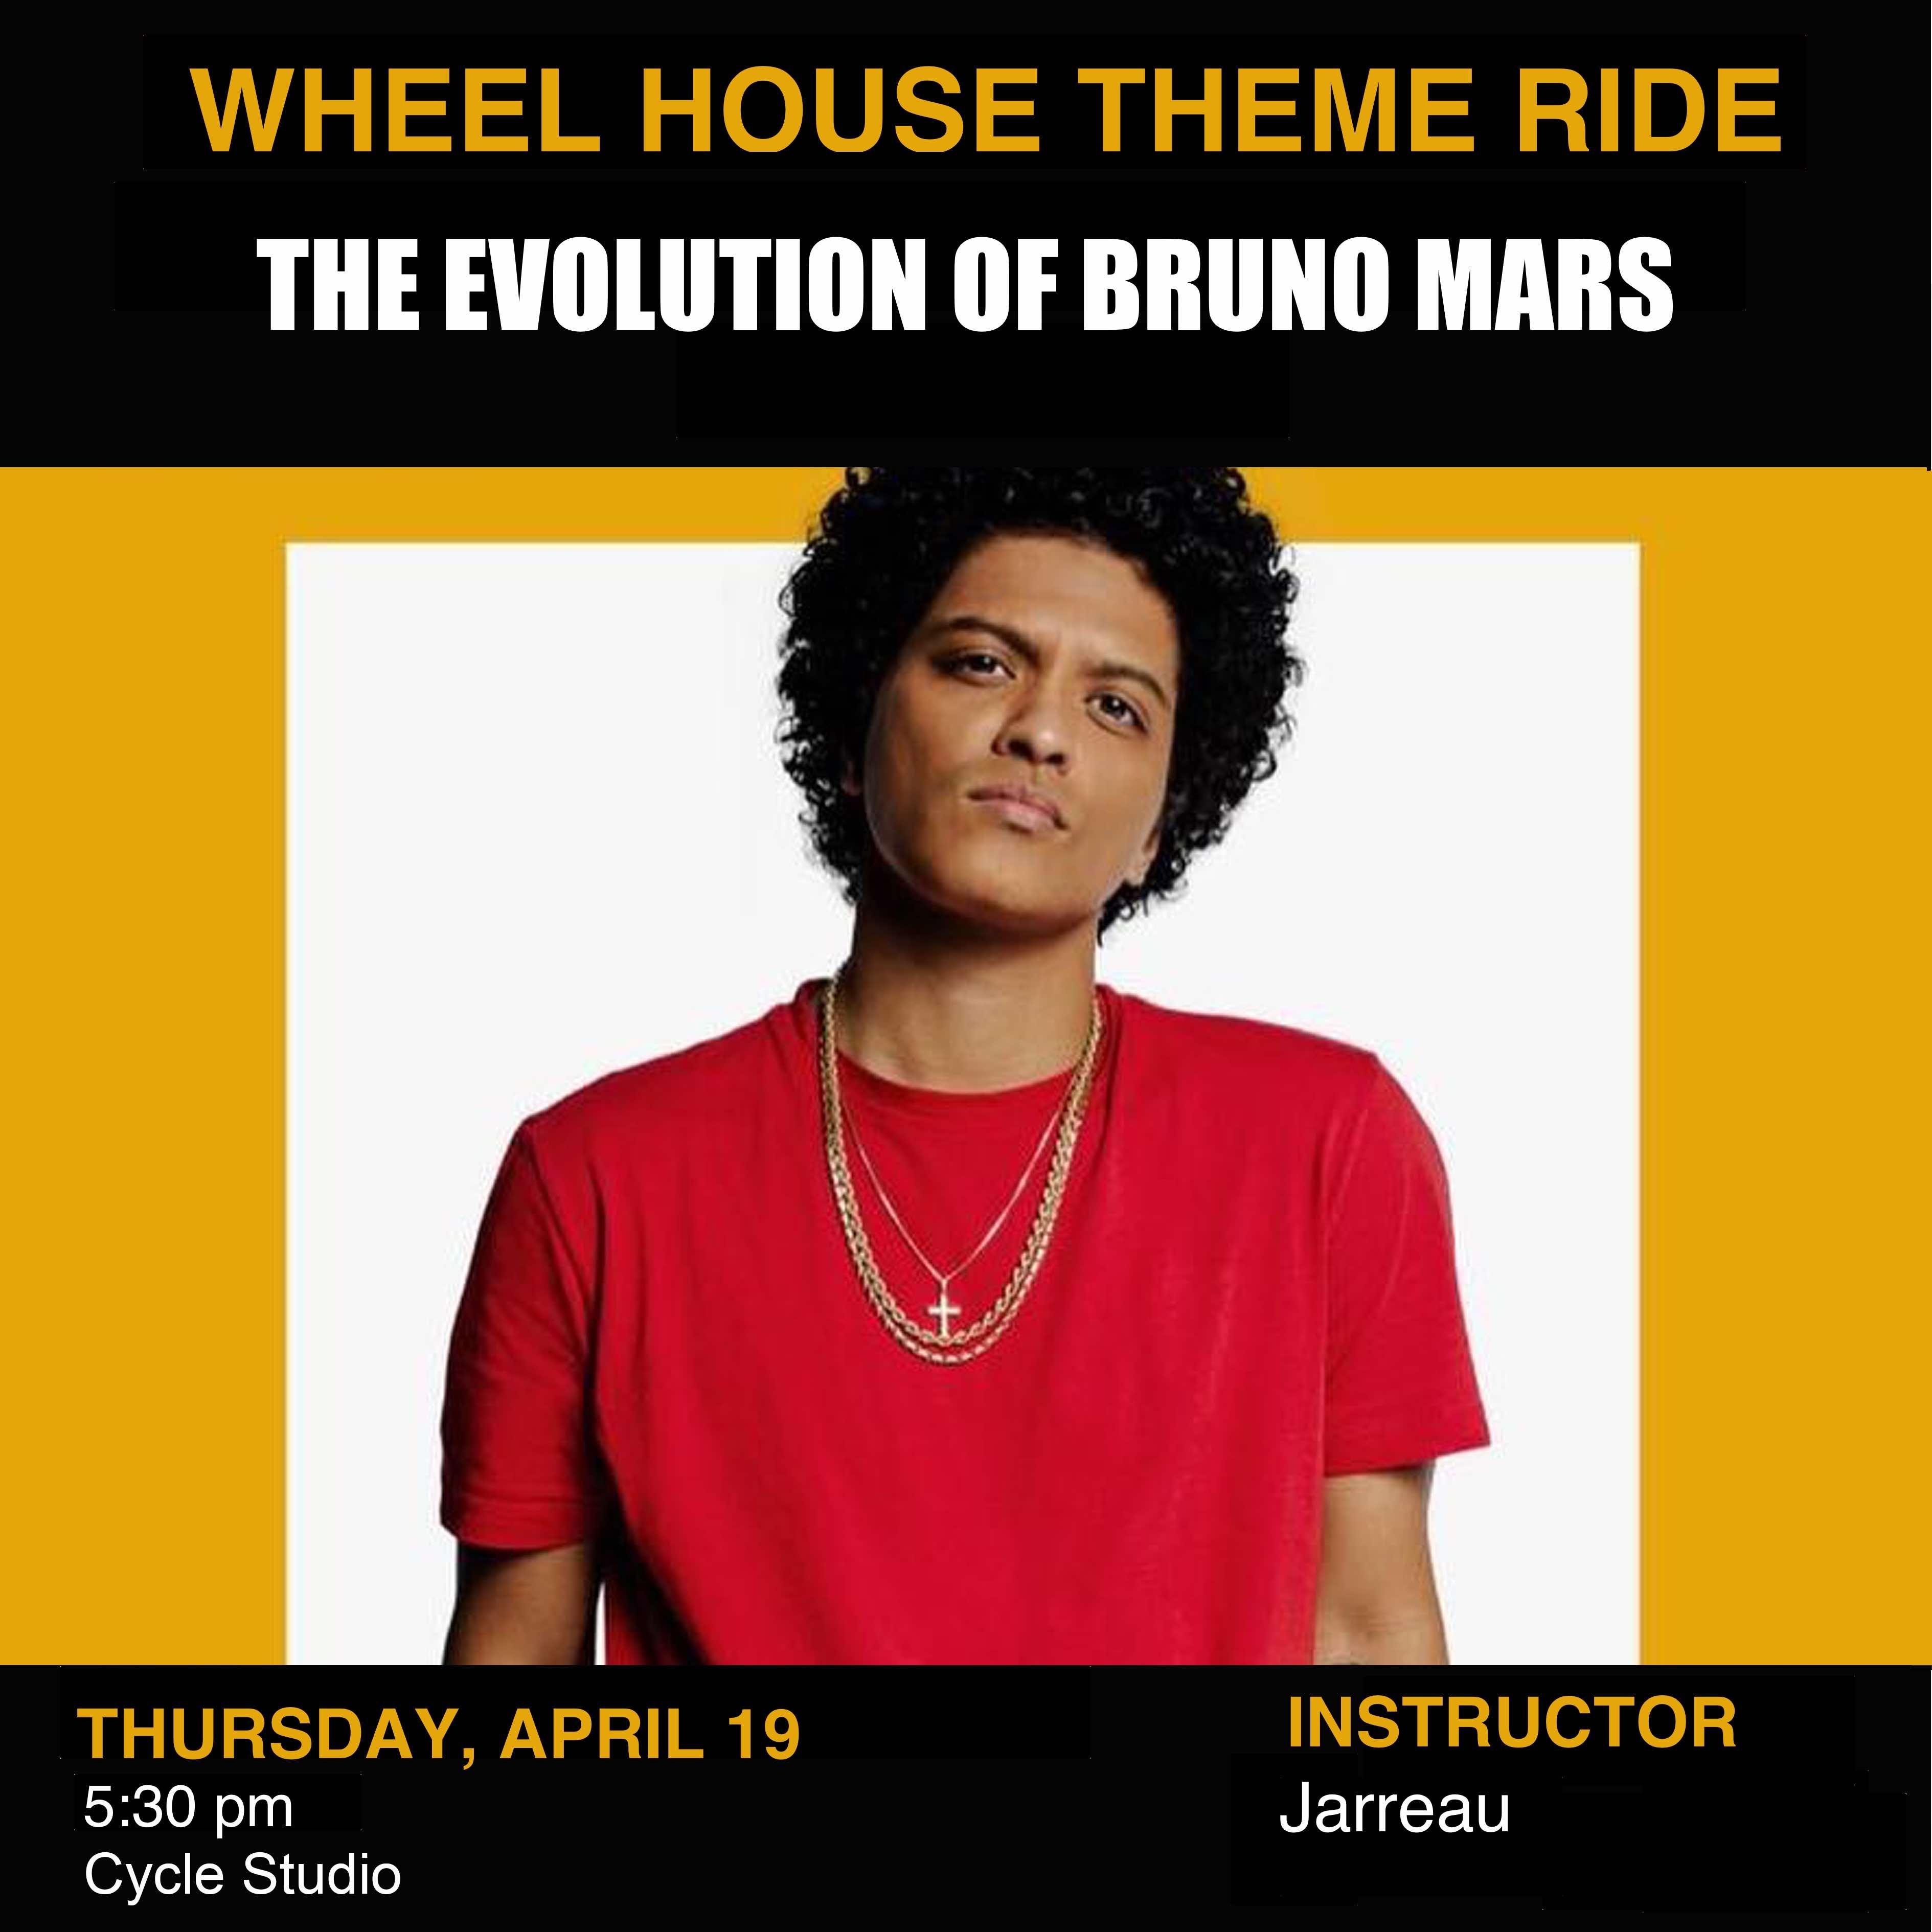 The Evolution of Bruno Mars